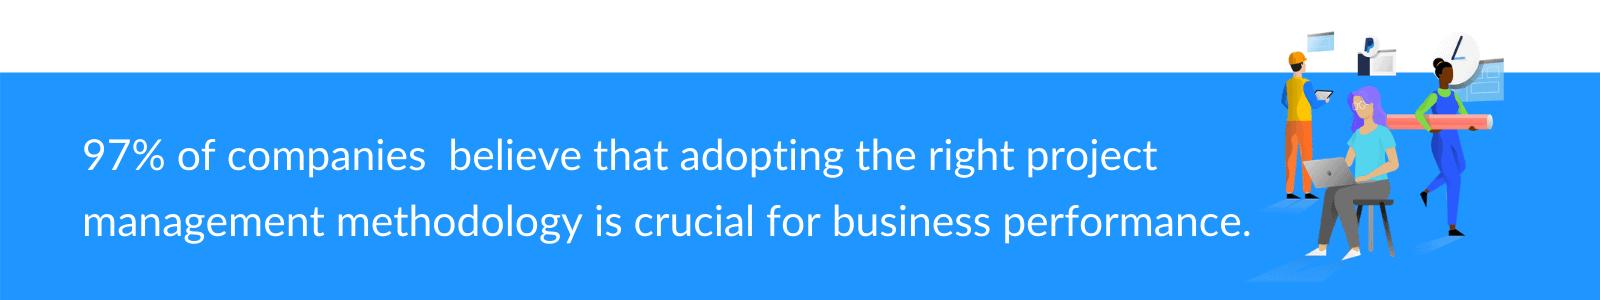 Adopting the right PM methodology